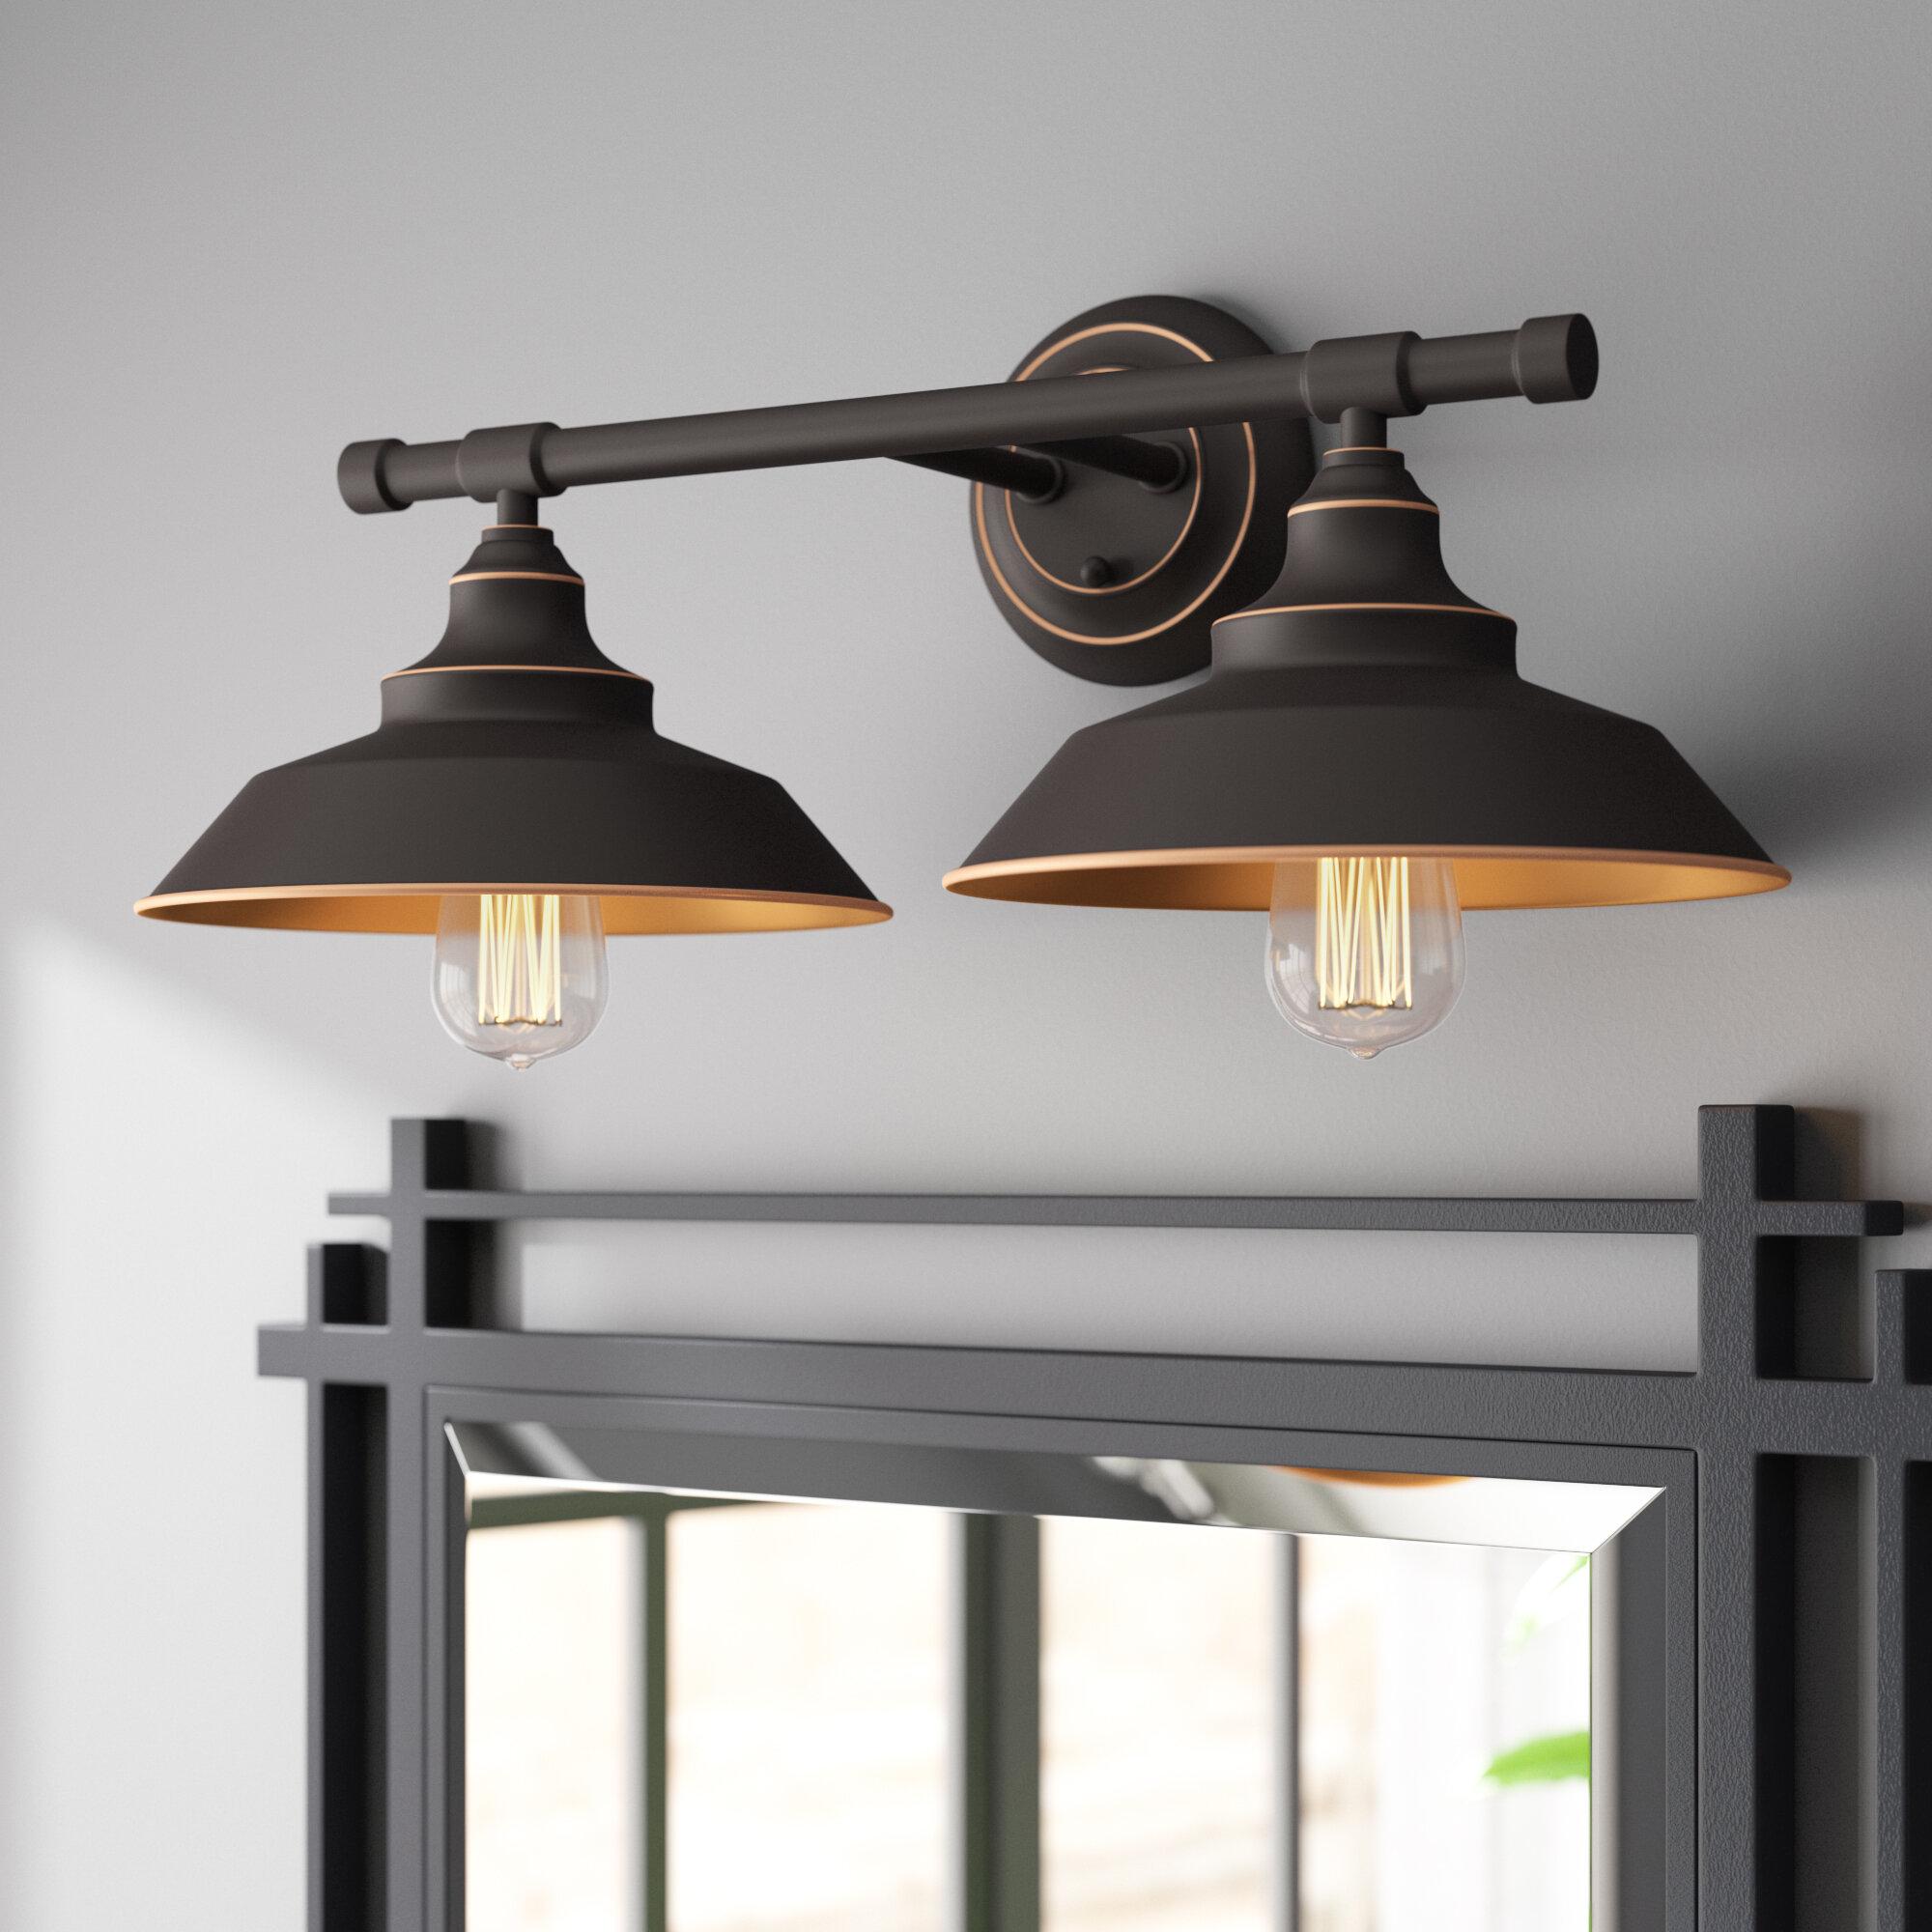 Williston Forge Myndi 2 Light Dimmable Oil Rubbed Bronze Vanity Light Reviews Wayfair